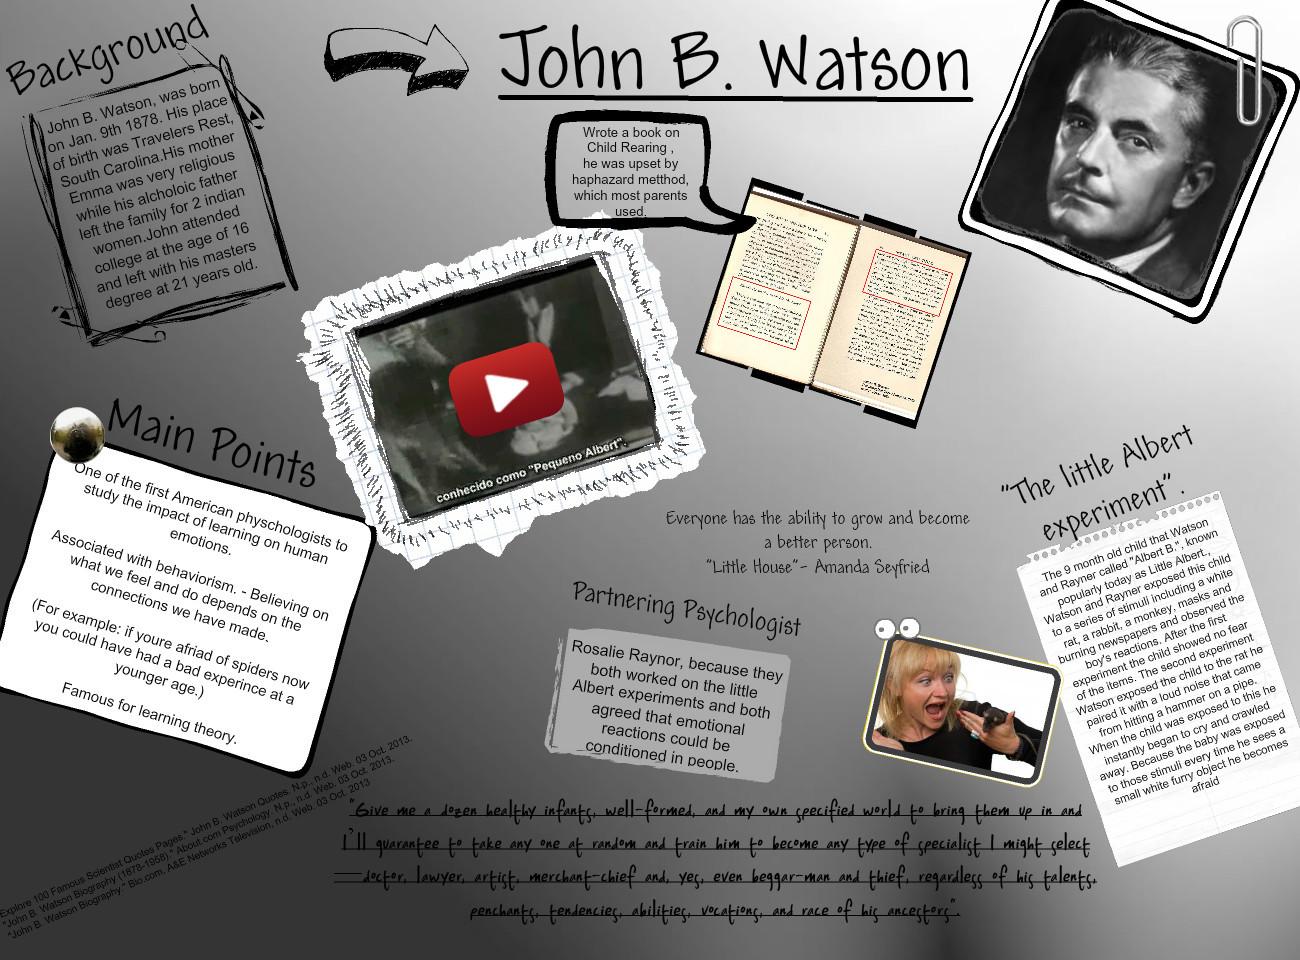 letter to john b watson John broadus watson (january 9, 1878 – september 25, 1958) was an american psychologist who established the psychological school of behaviorism, after doing research on animal behavior.